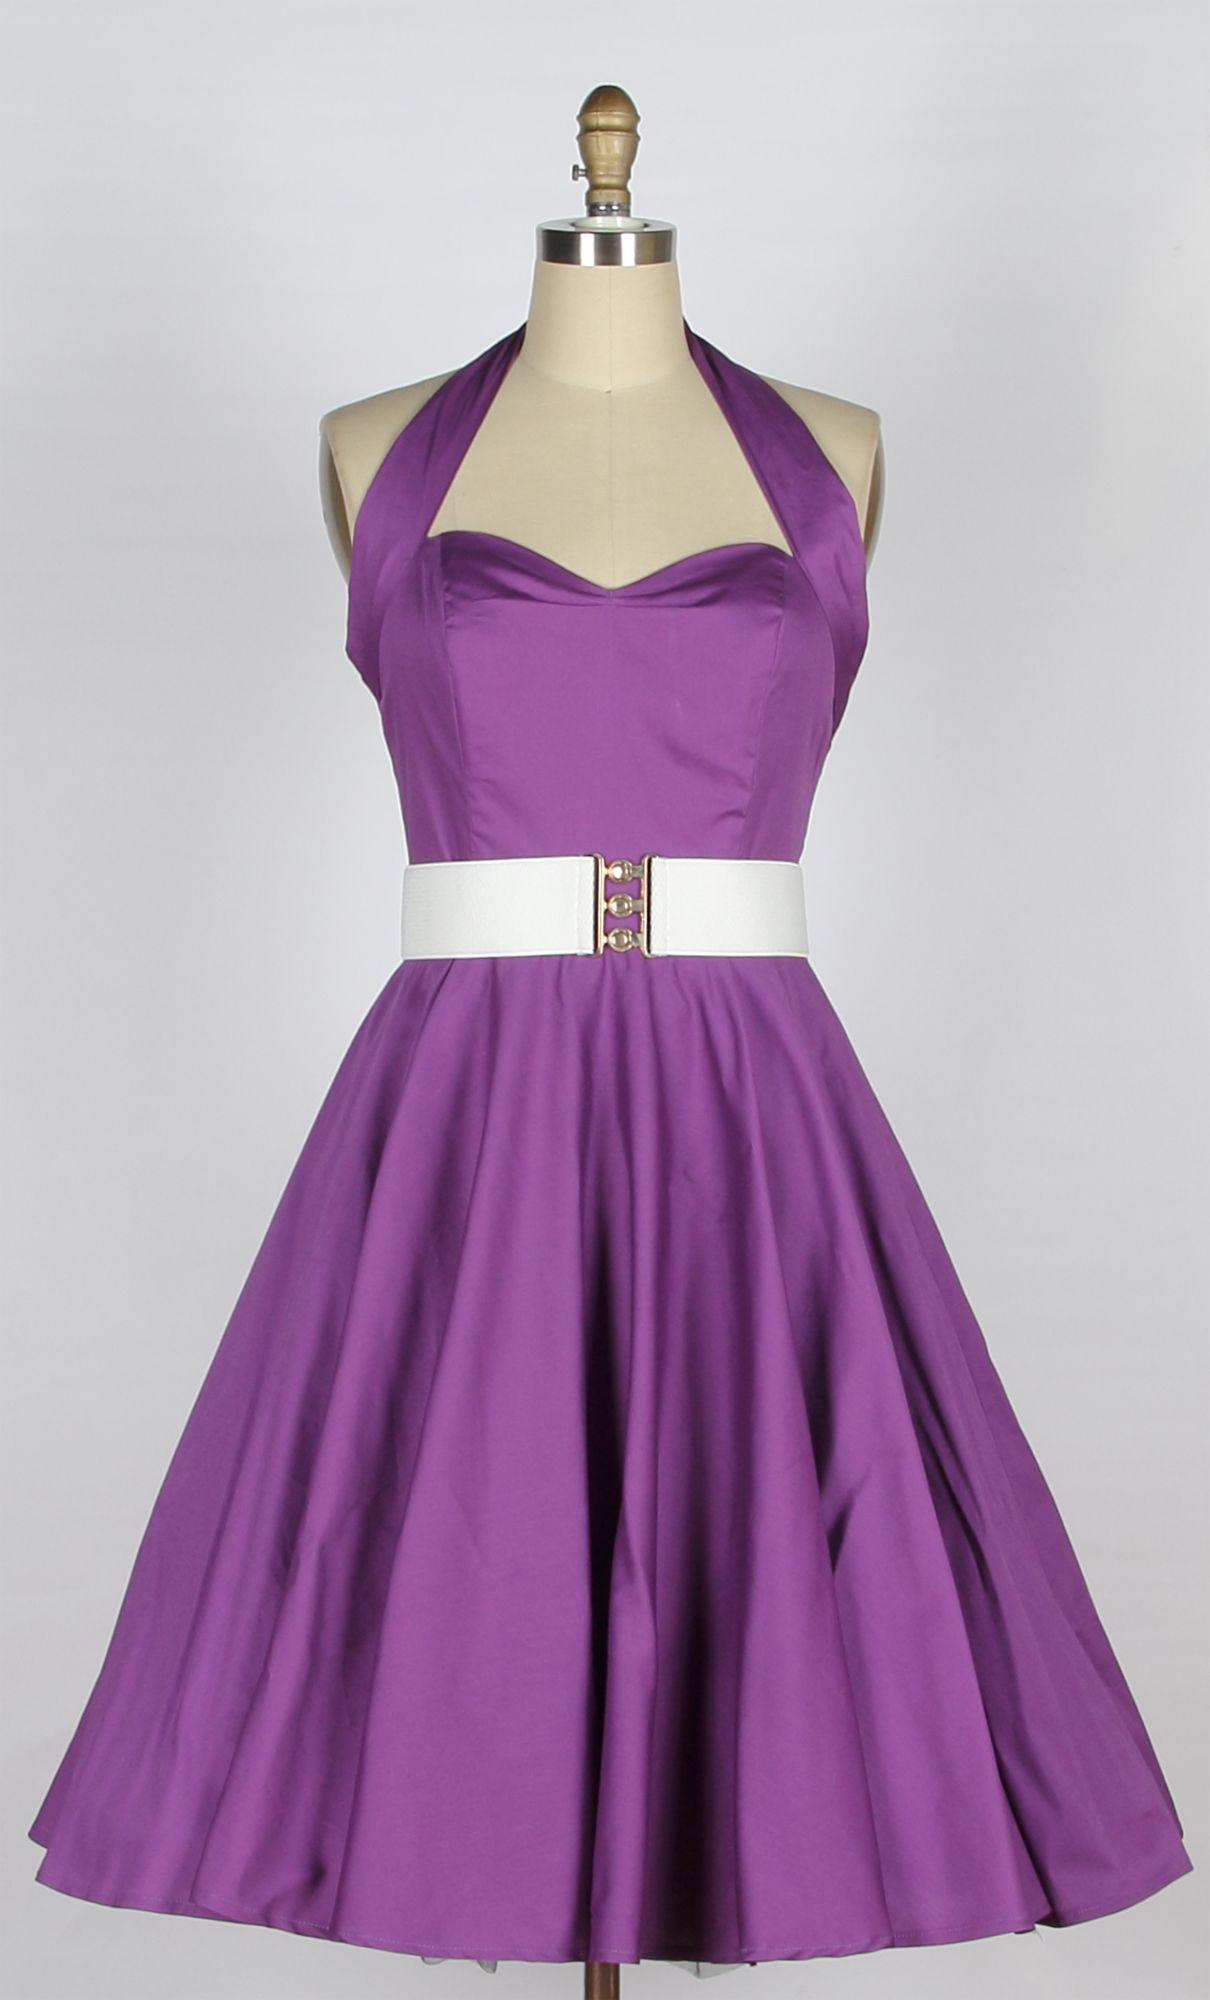 Charming purple dress httpikuzoladycharming purple dress halterneck cotton swing dress purple queen of holloway dressing shop ombrellifo Gallery